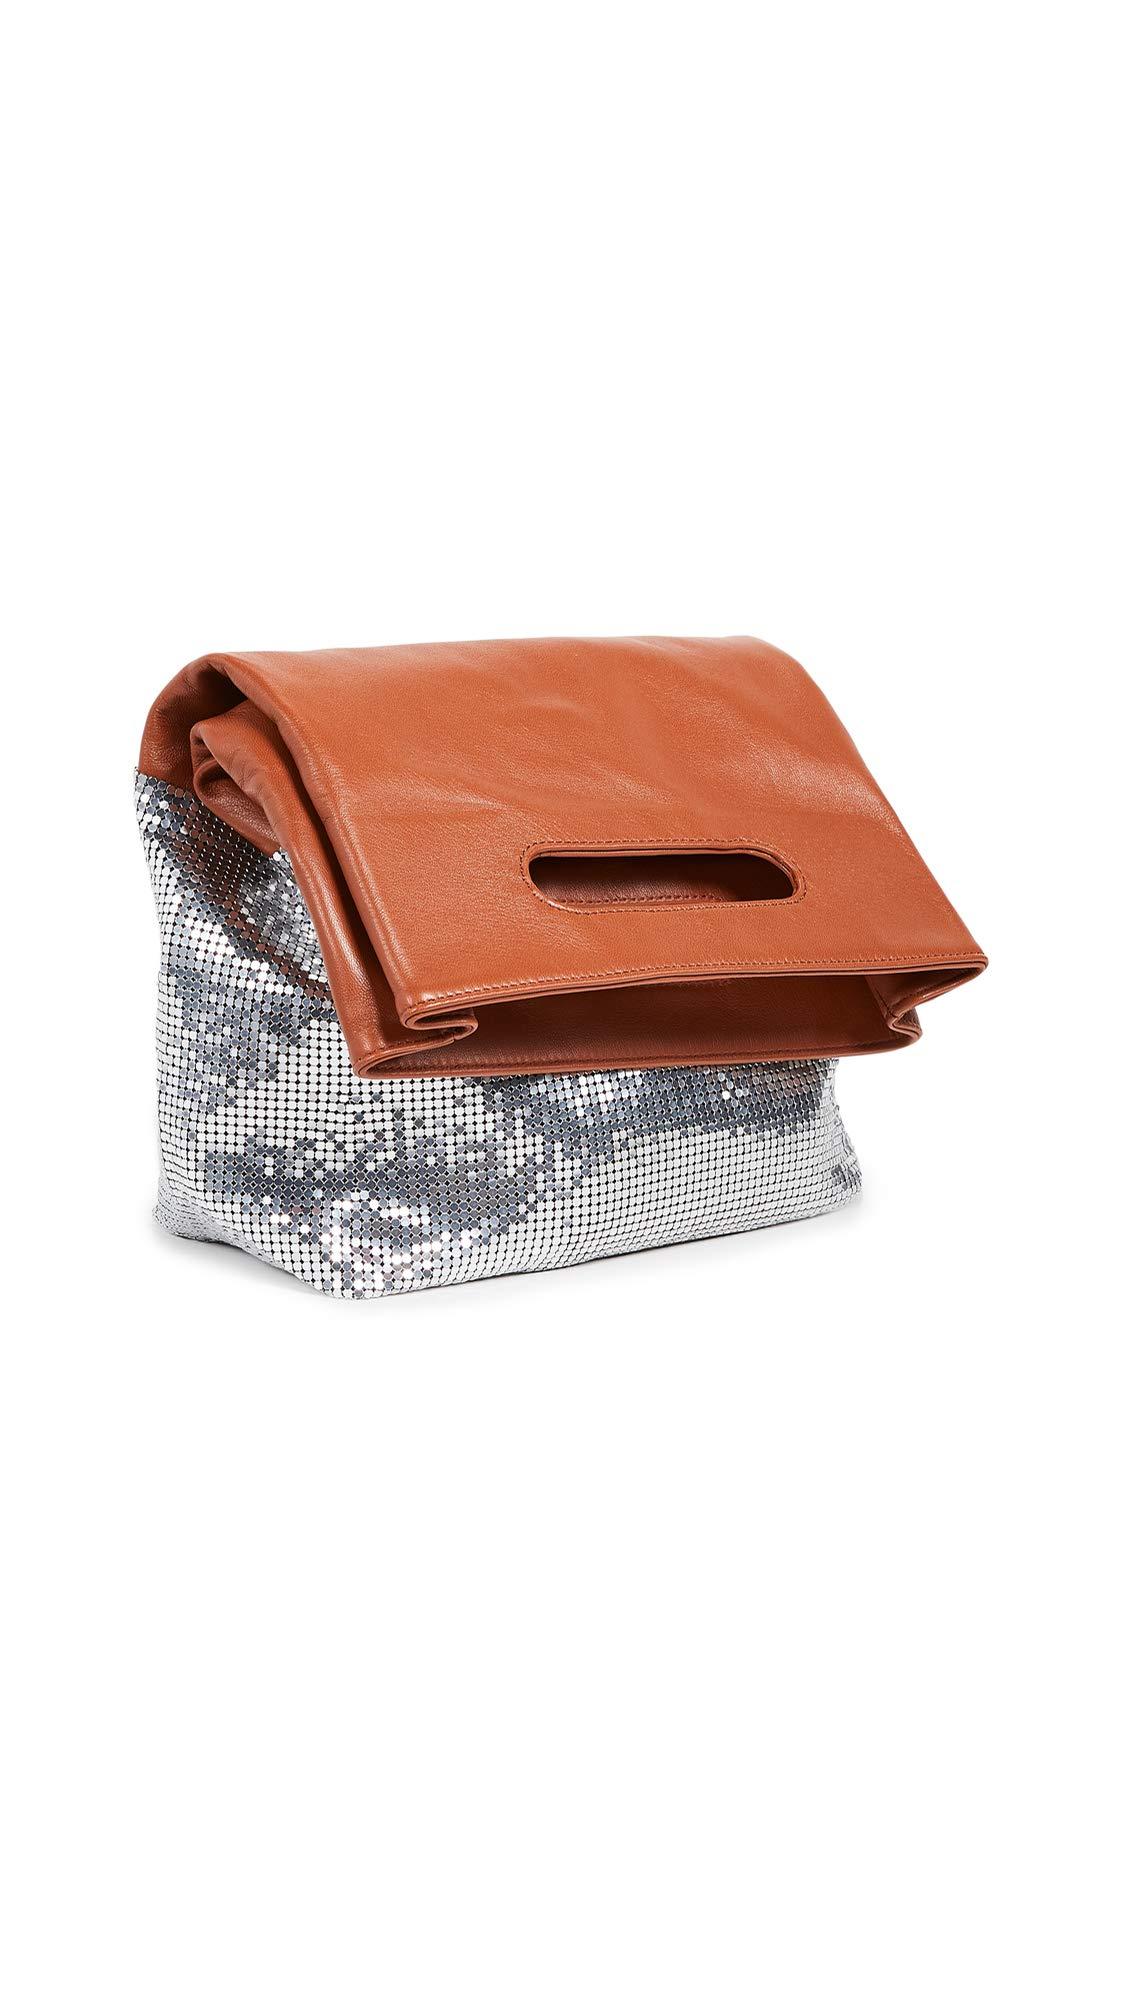 Paco Rabanne Women's Folding Clutch, Rust/Silver, One Size